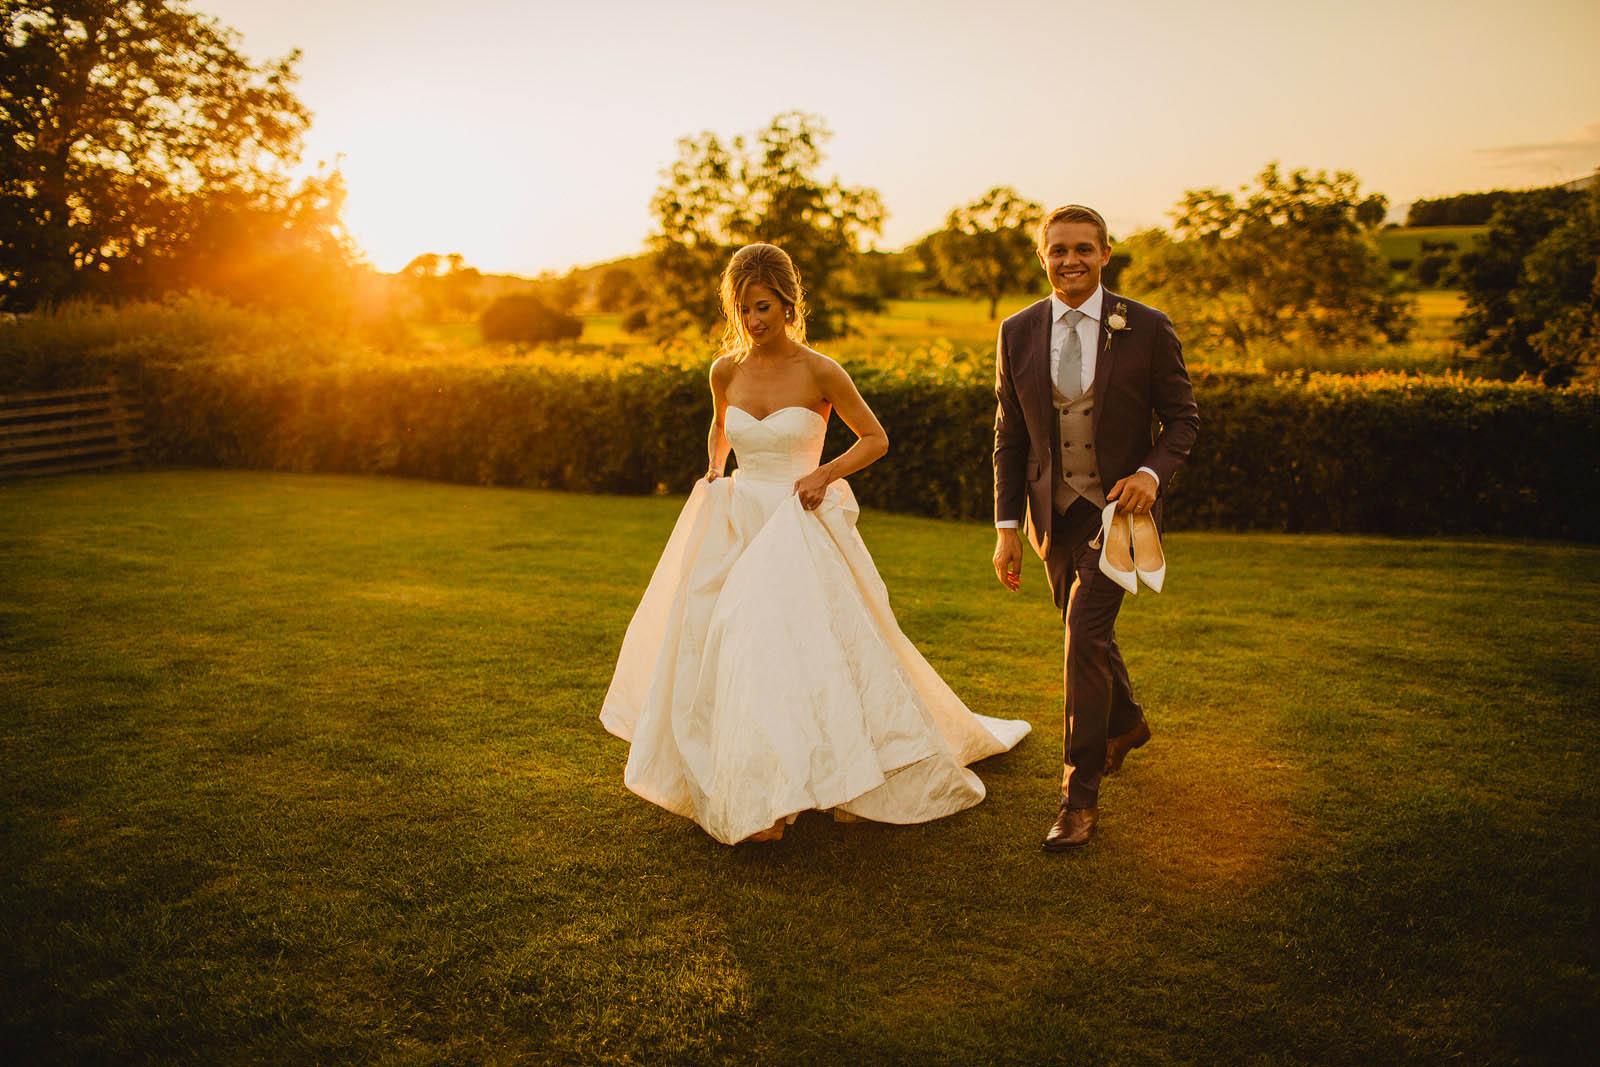 best wedding photographers in UK